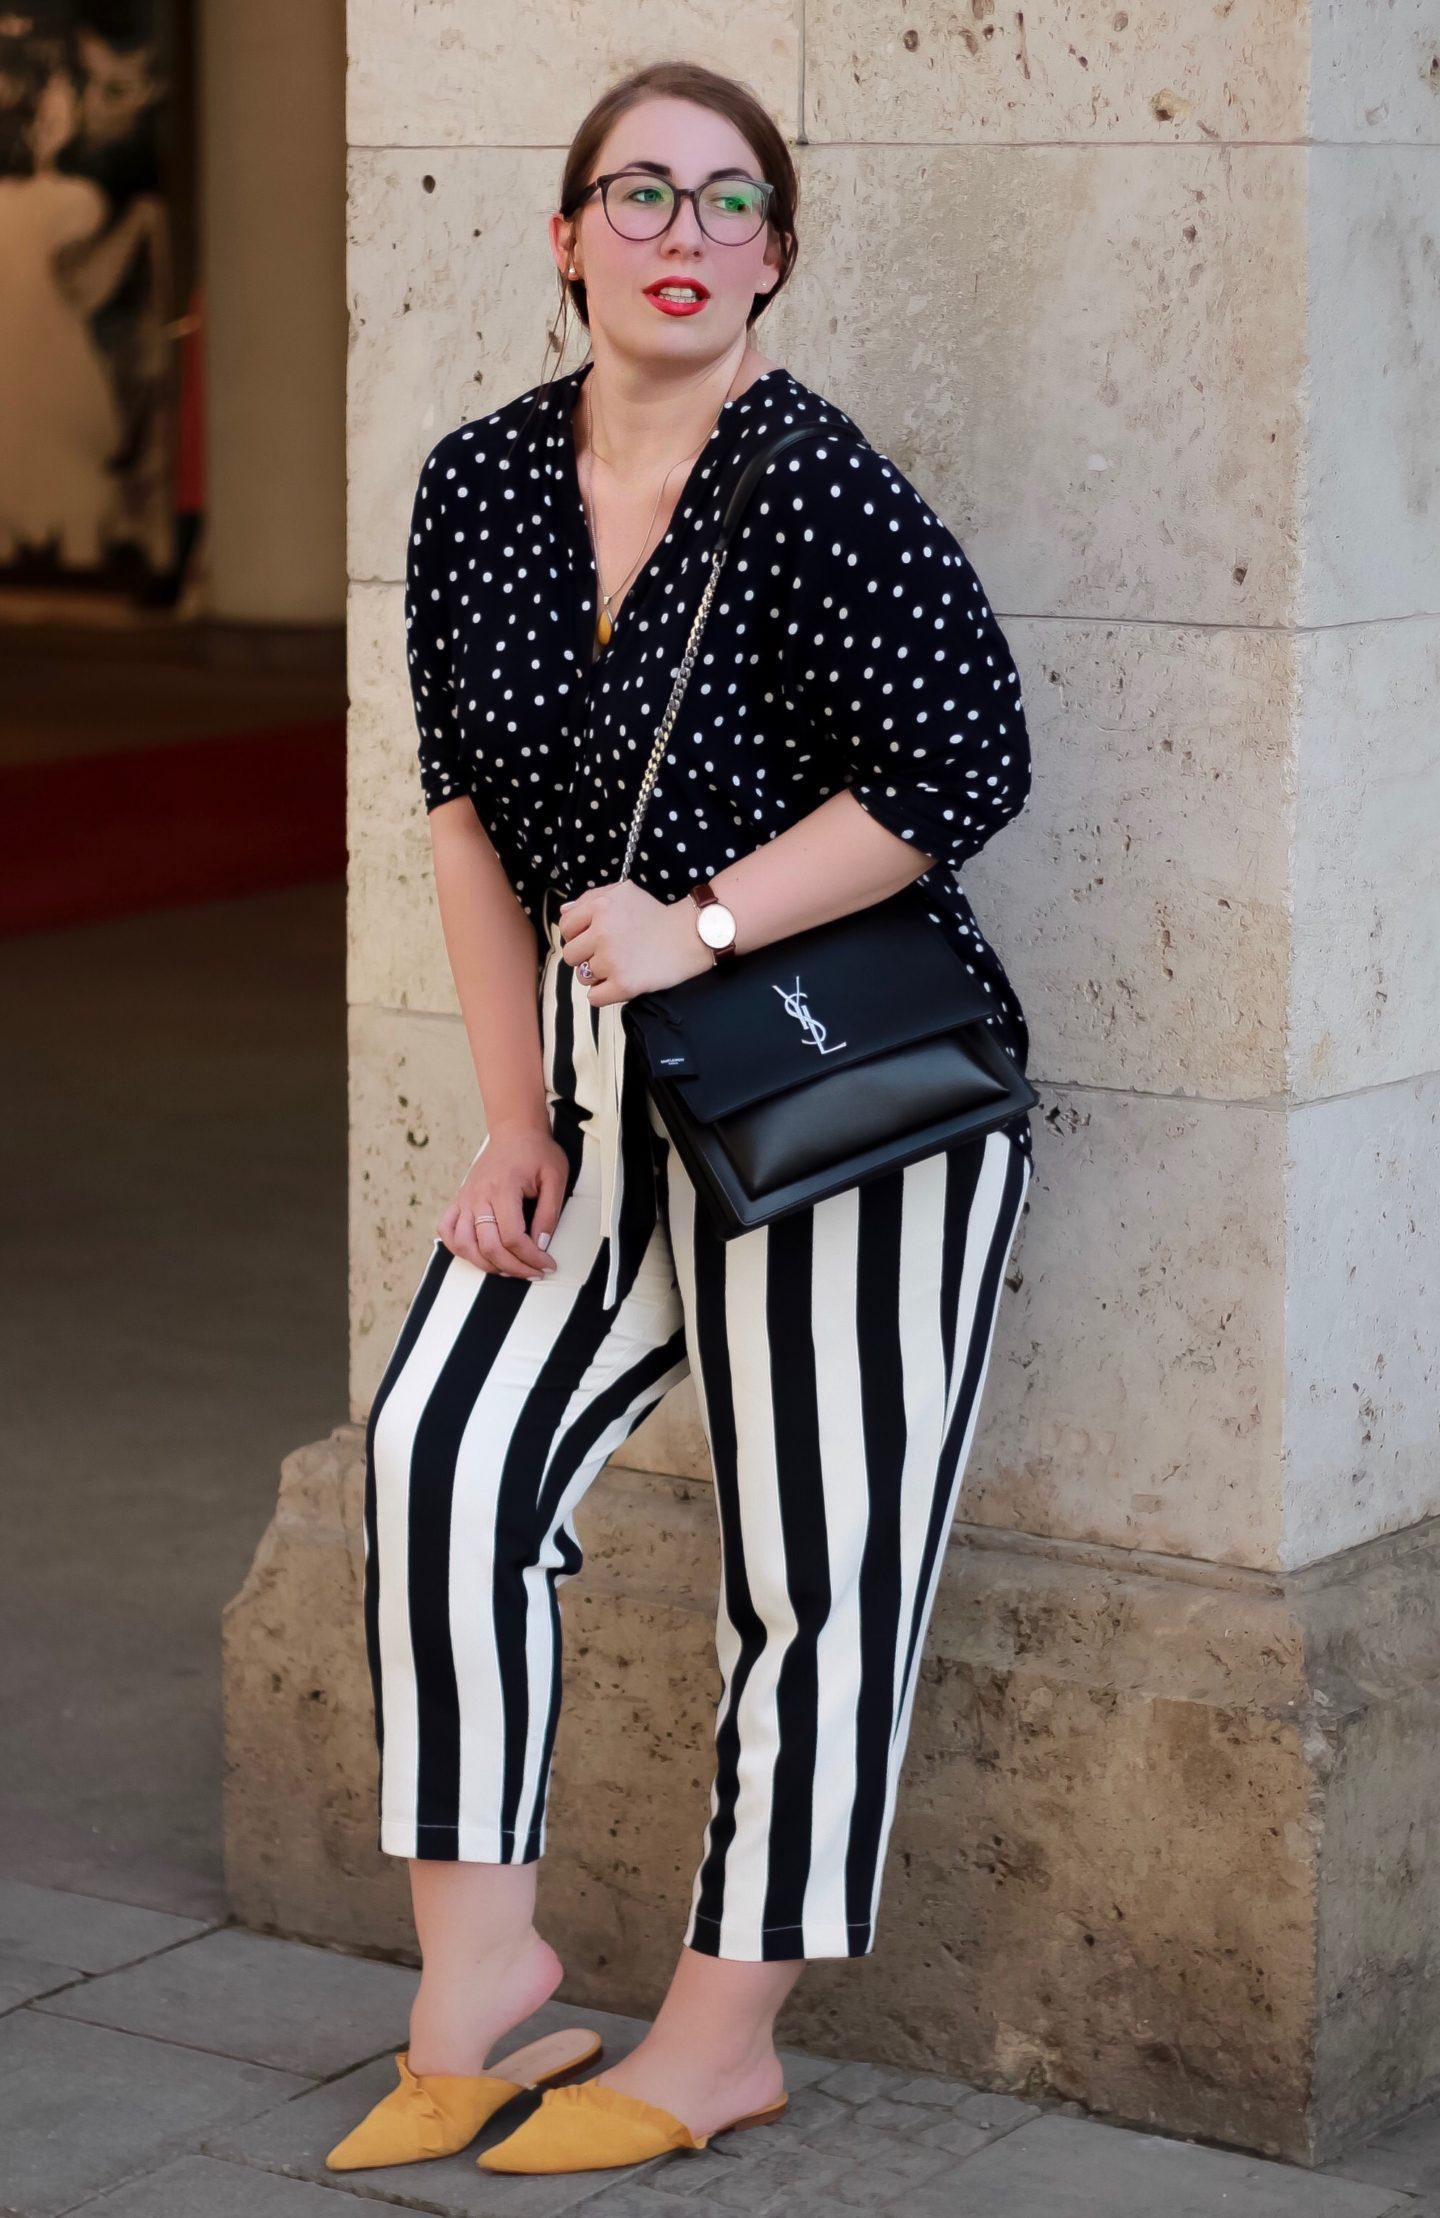 Outfit-Mustermix-Polka-Dots-Streifen-YSL-Saint-Laurent-Sunset-Miss-Suzie-Loves-Susanne-Heidebach-München-Lodenfrey-Fashionblogger